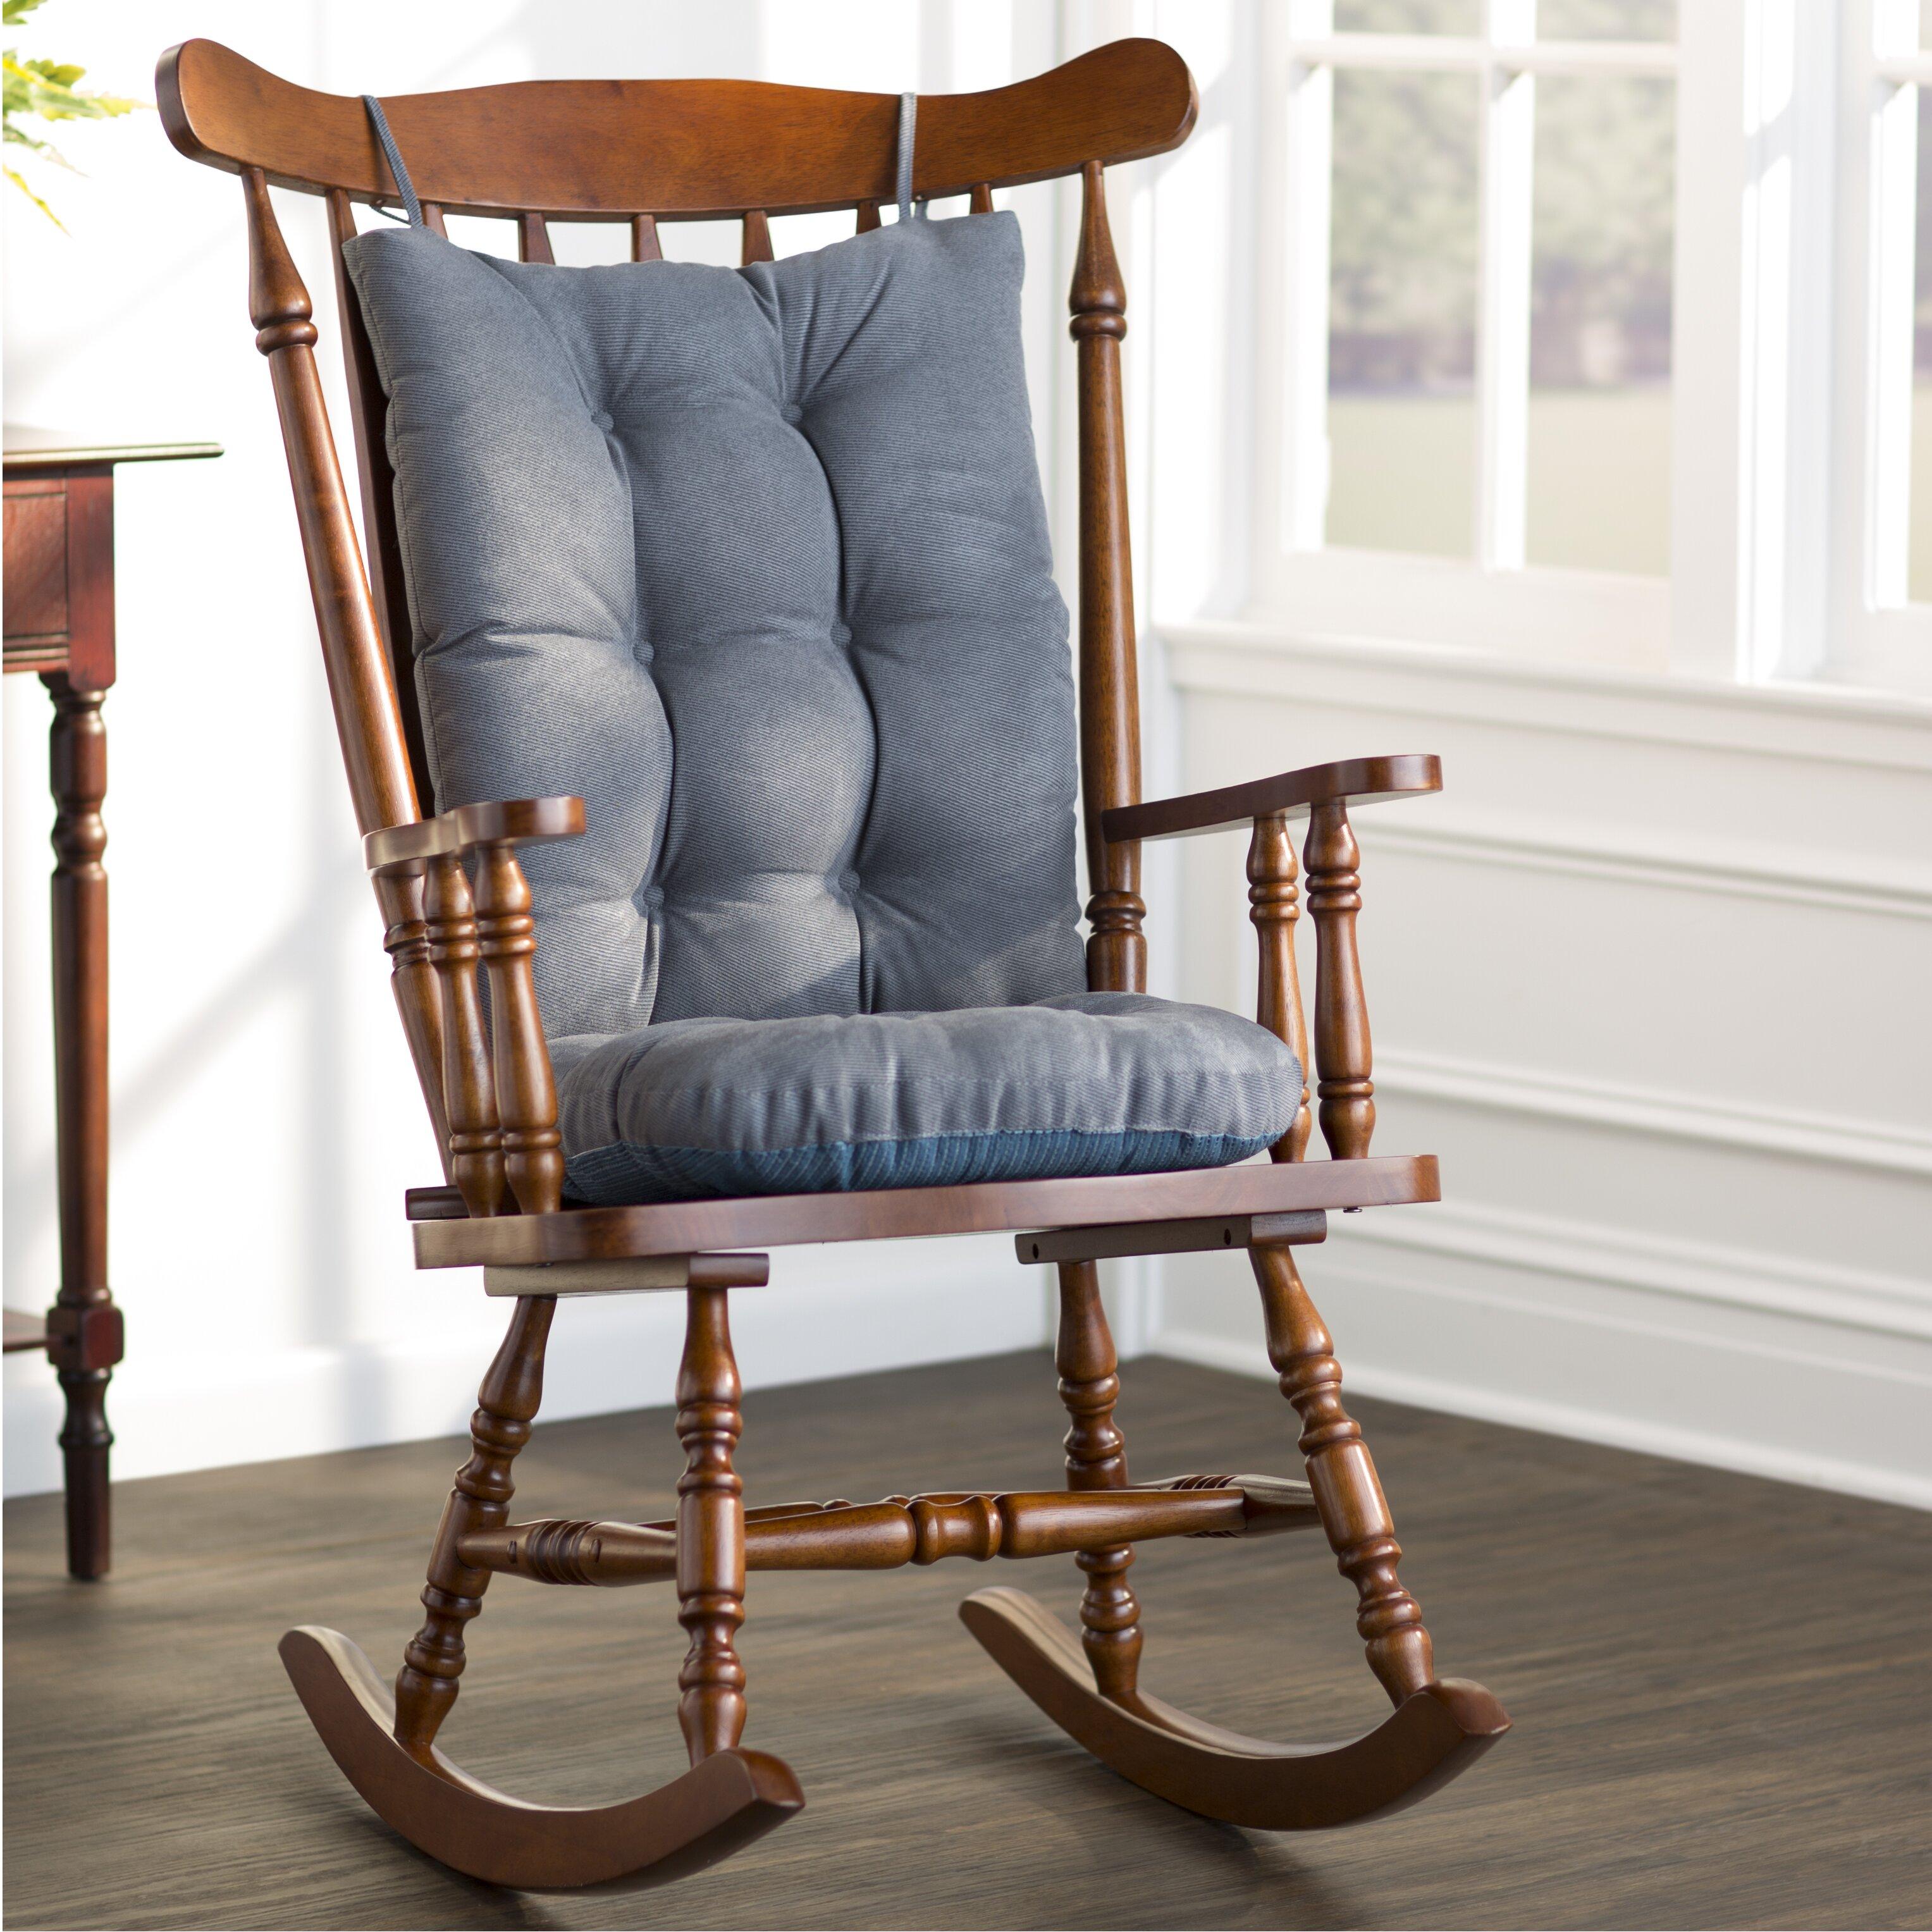 ... Basics Wayfair Basics Rocking Chair Cushion & Reviews  Wayfair